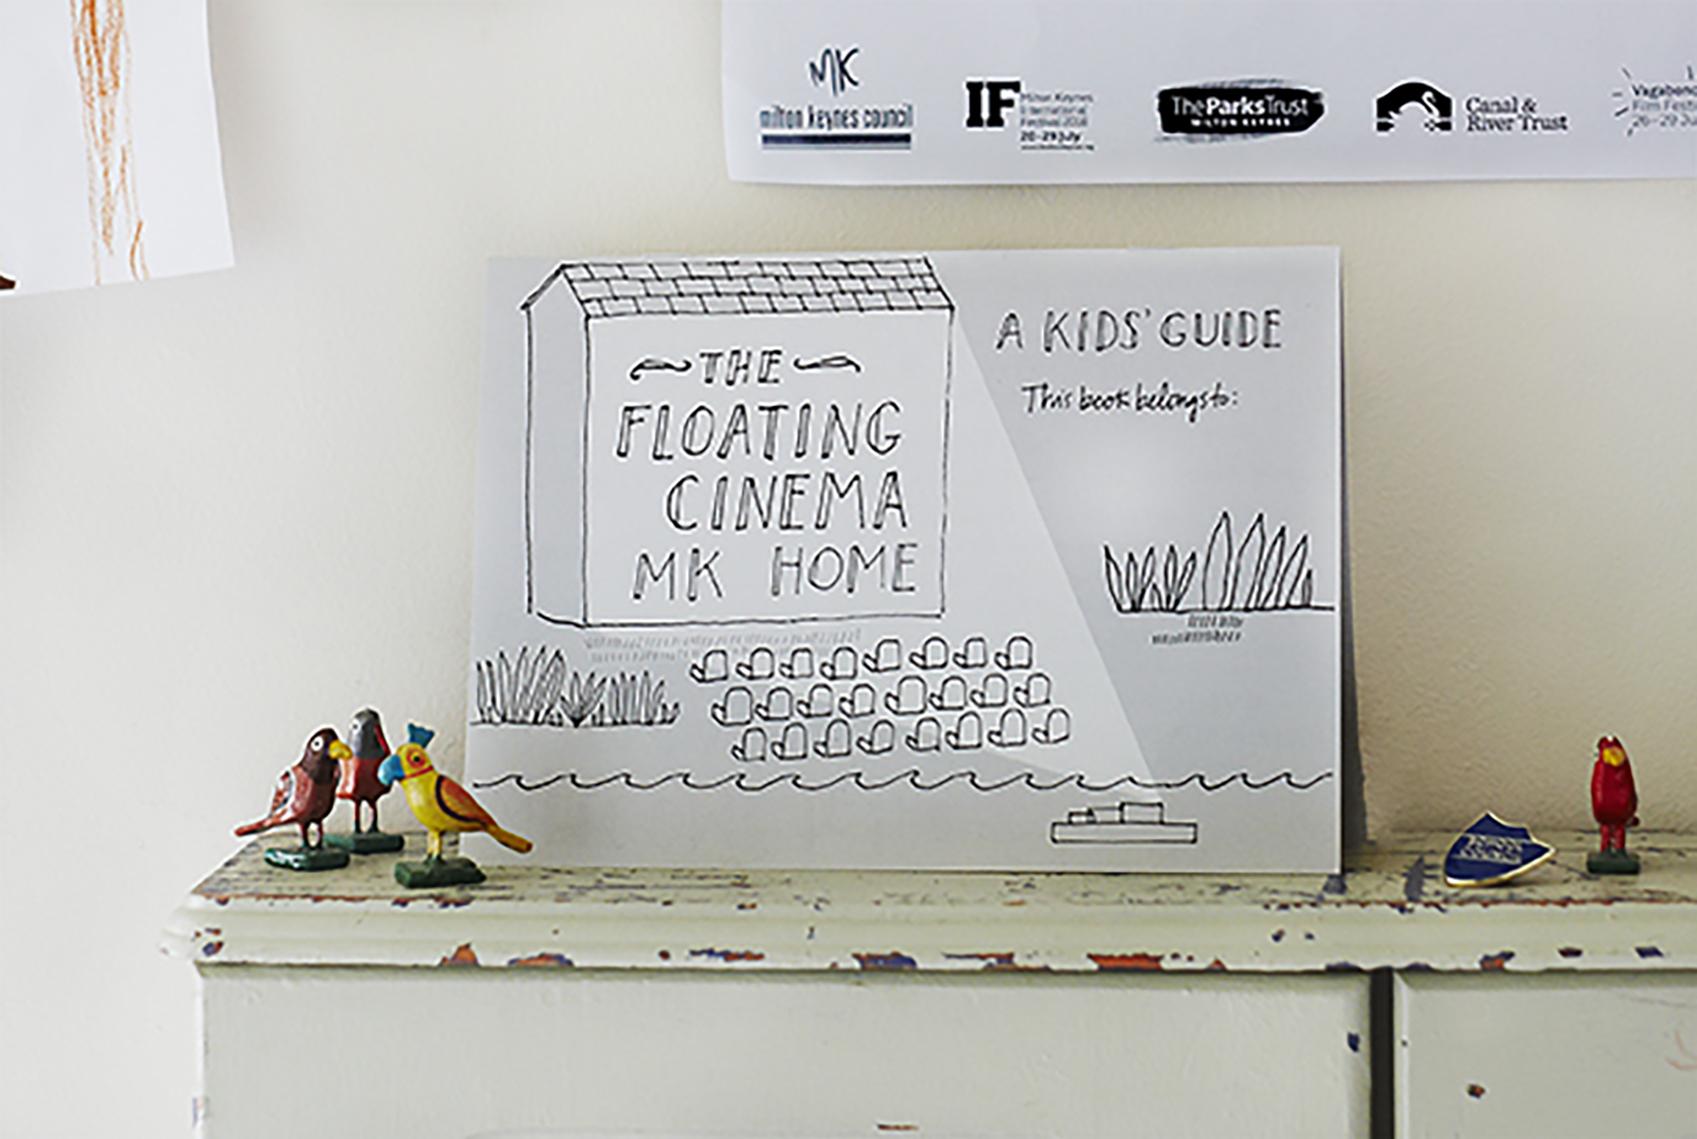 Kids' Guide to The Floating Cinema Milton Keynes: HOME; Milton Keynes, Summer 2018